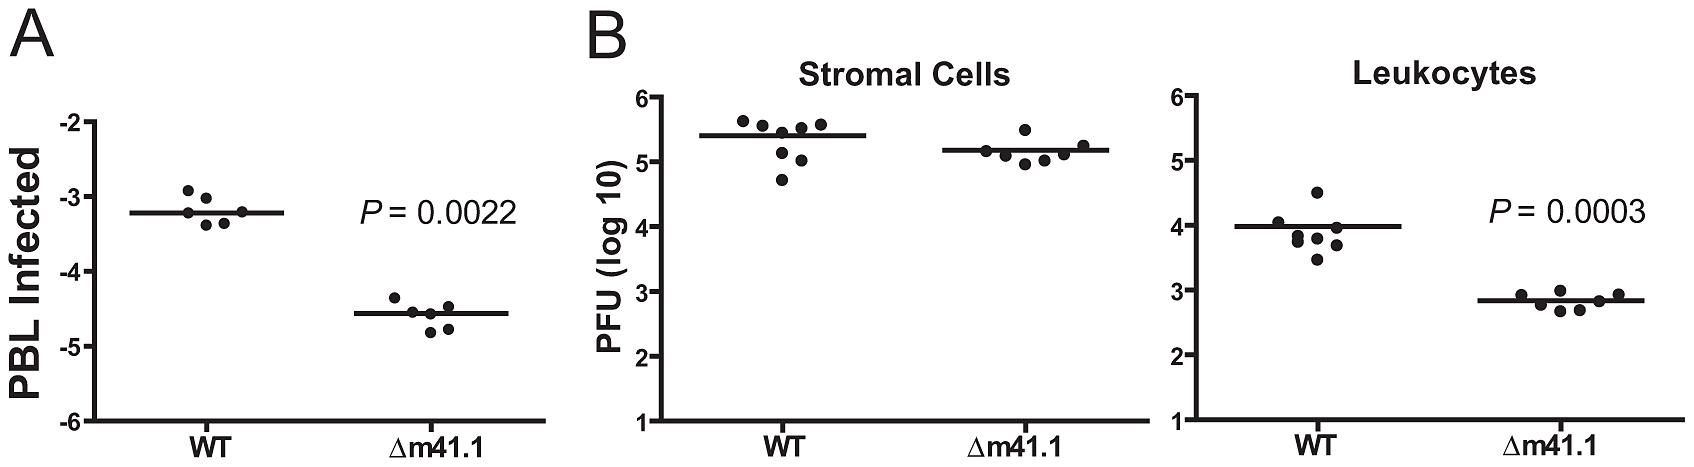 m41.1 enhances viral replication in leukocytes.